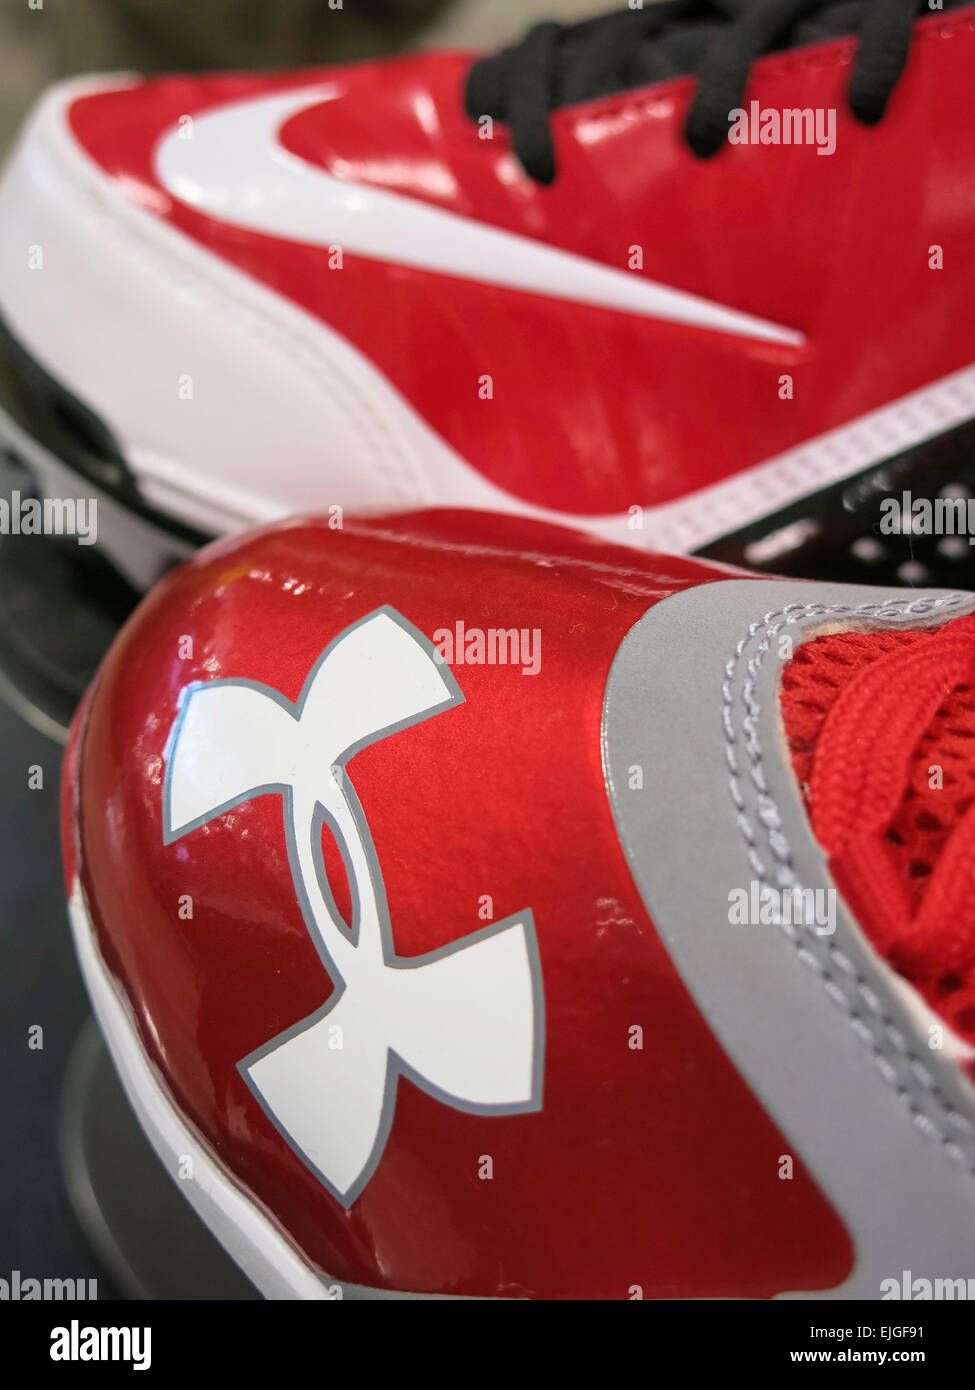 Nike Trainers Sneakers Immagini   Nike Trainers Sneakers Fotos Stock ... 819409cbb2c